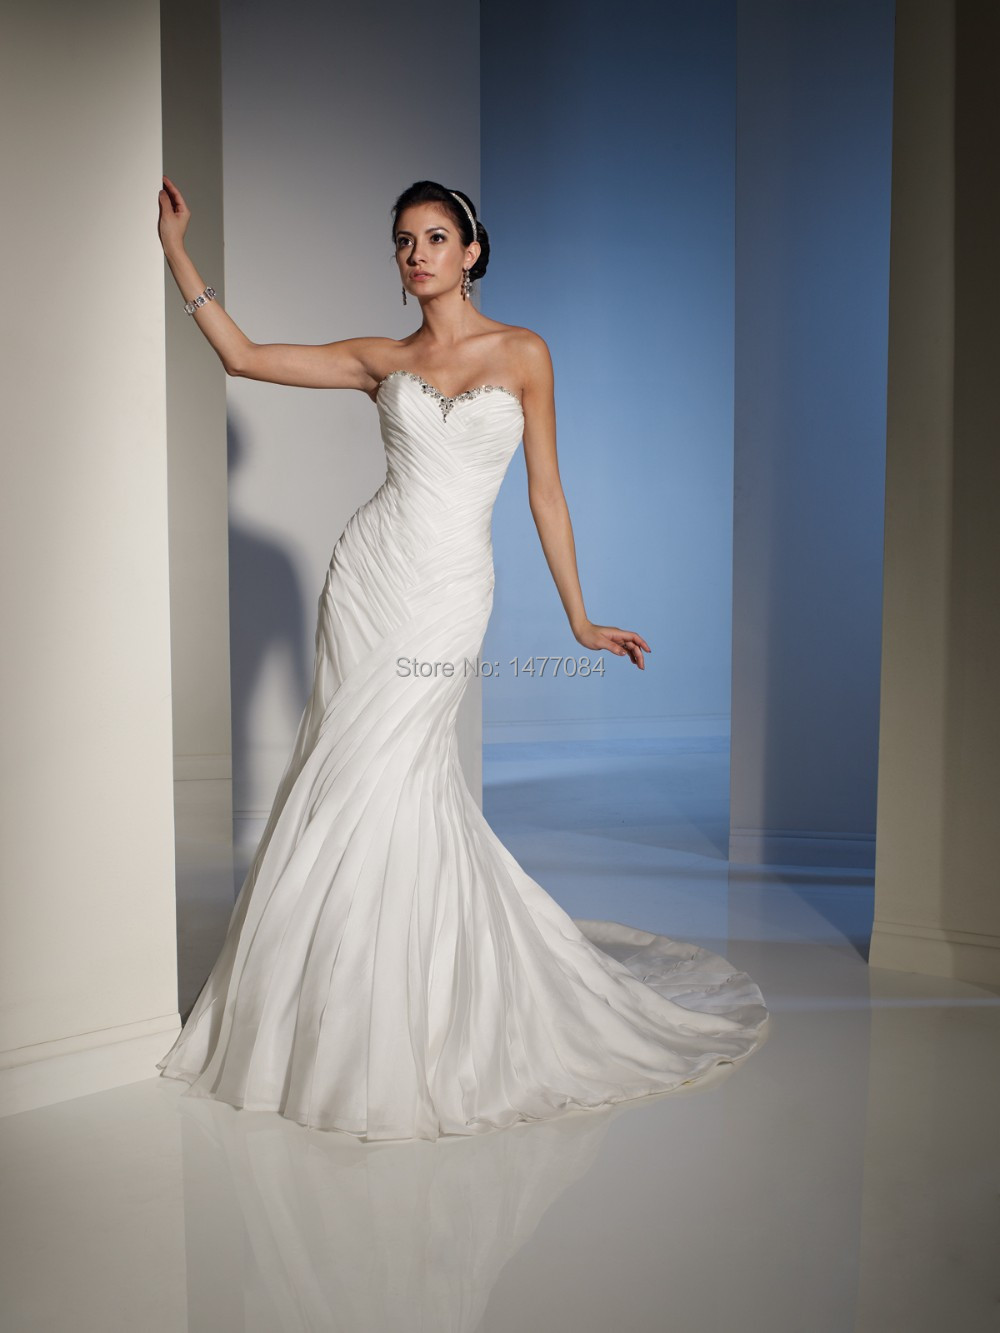 Nice Corset Bra For Wedding Dress Elaboration - All Wedding Dresses ...